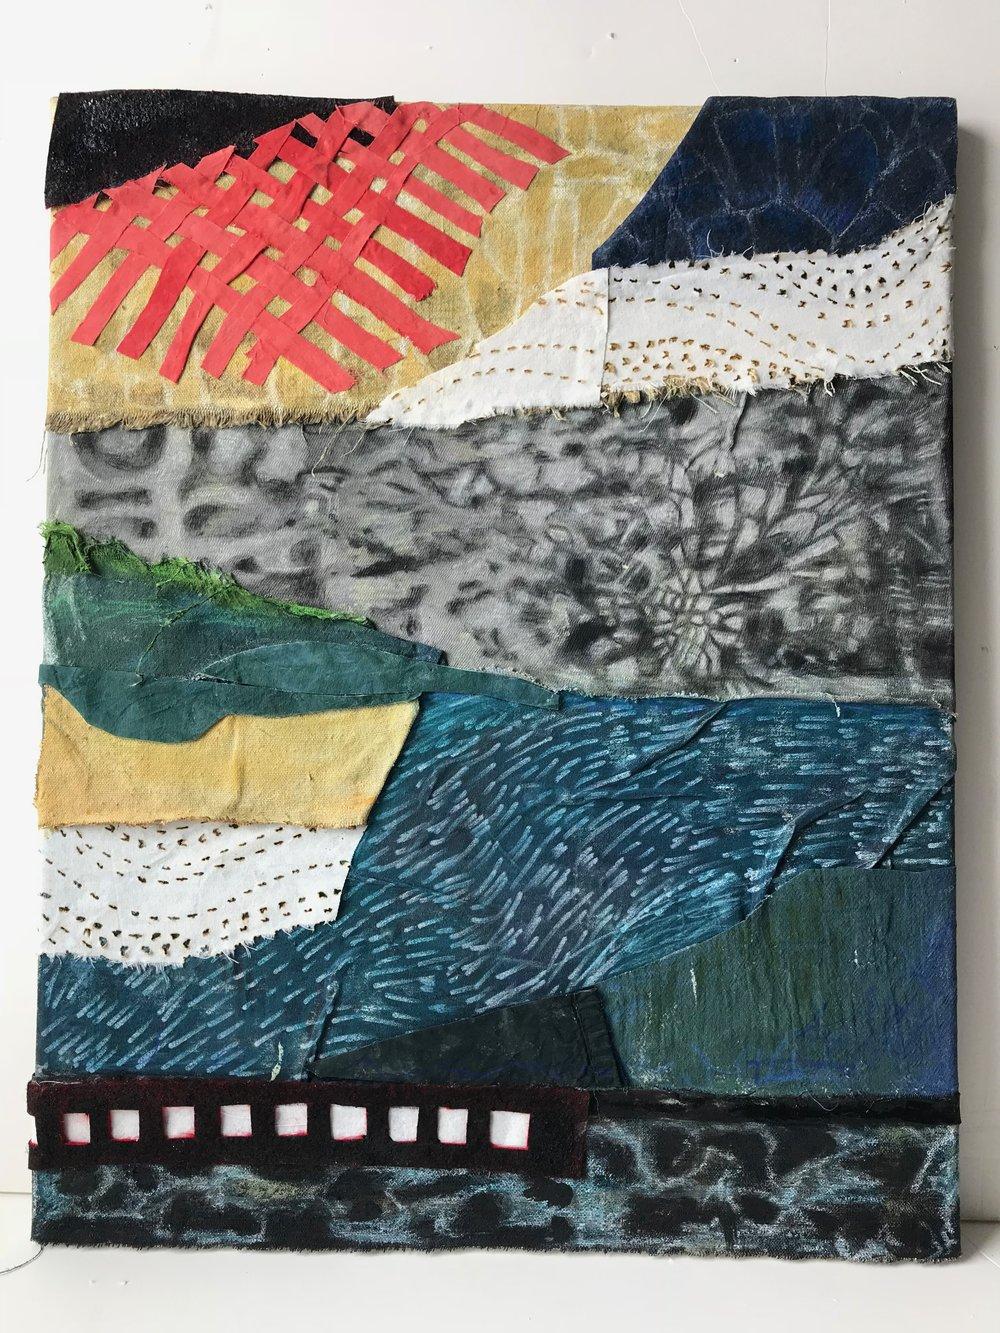 h-faessel-18x24-fabric-collage2.jpg.jpg